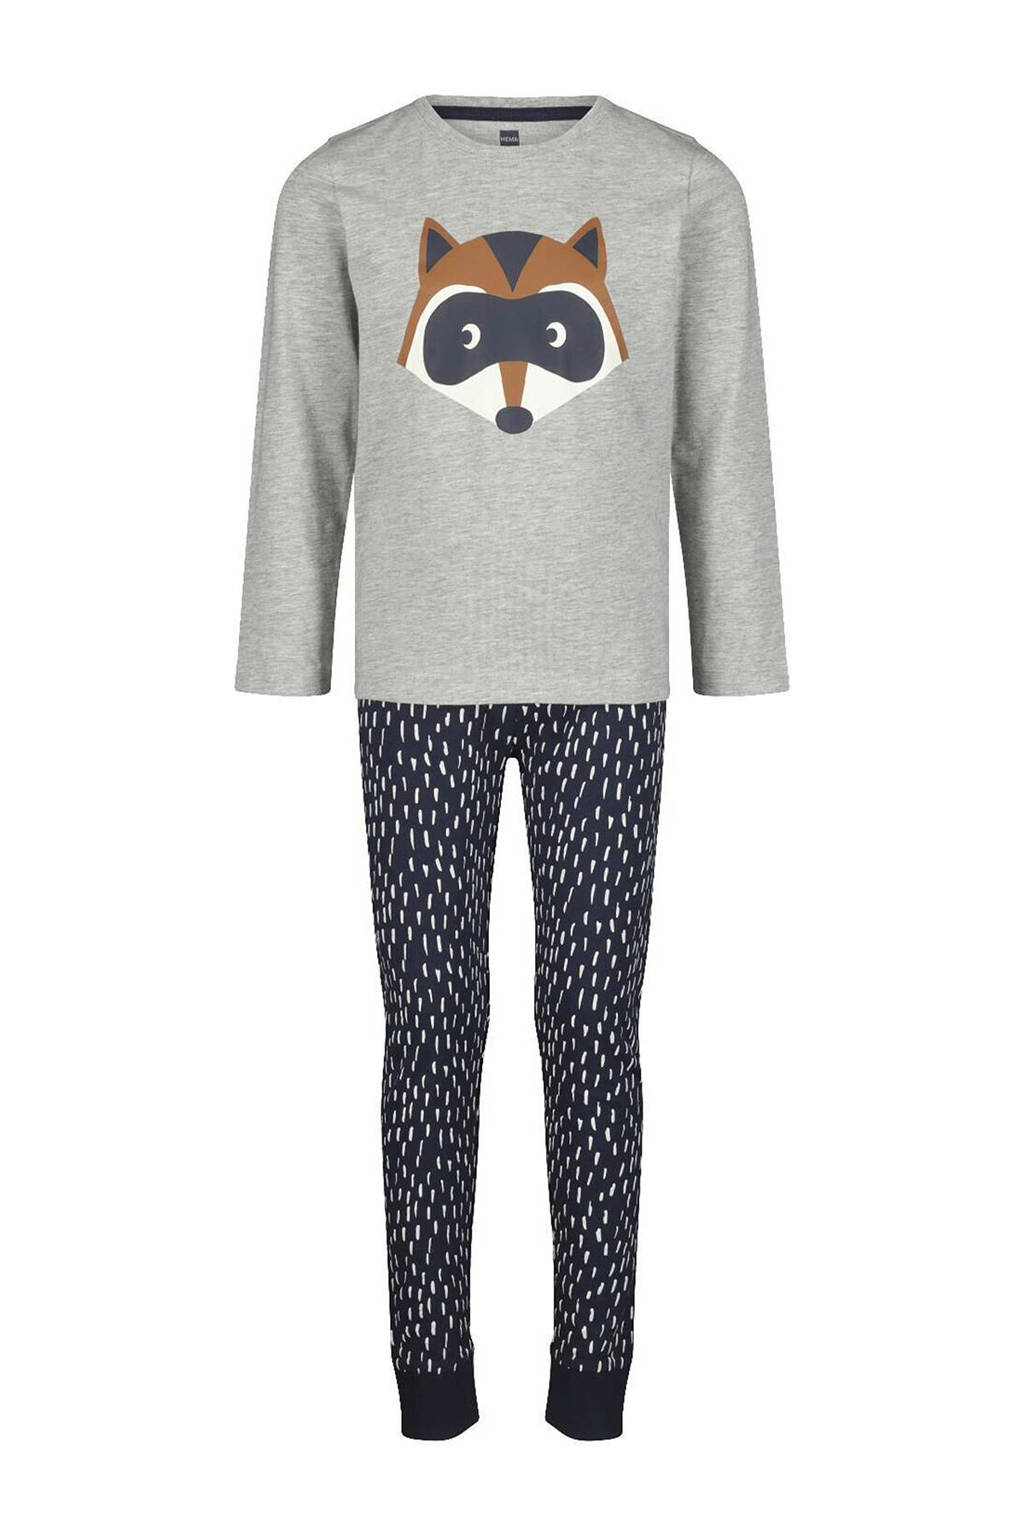 HEMA   pyjama printopdruk grijs/blauw, Grijs/blauw